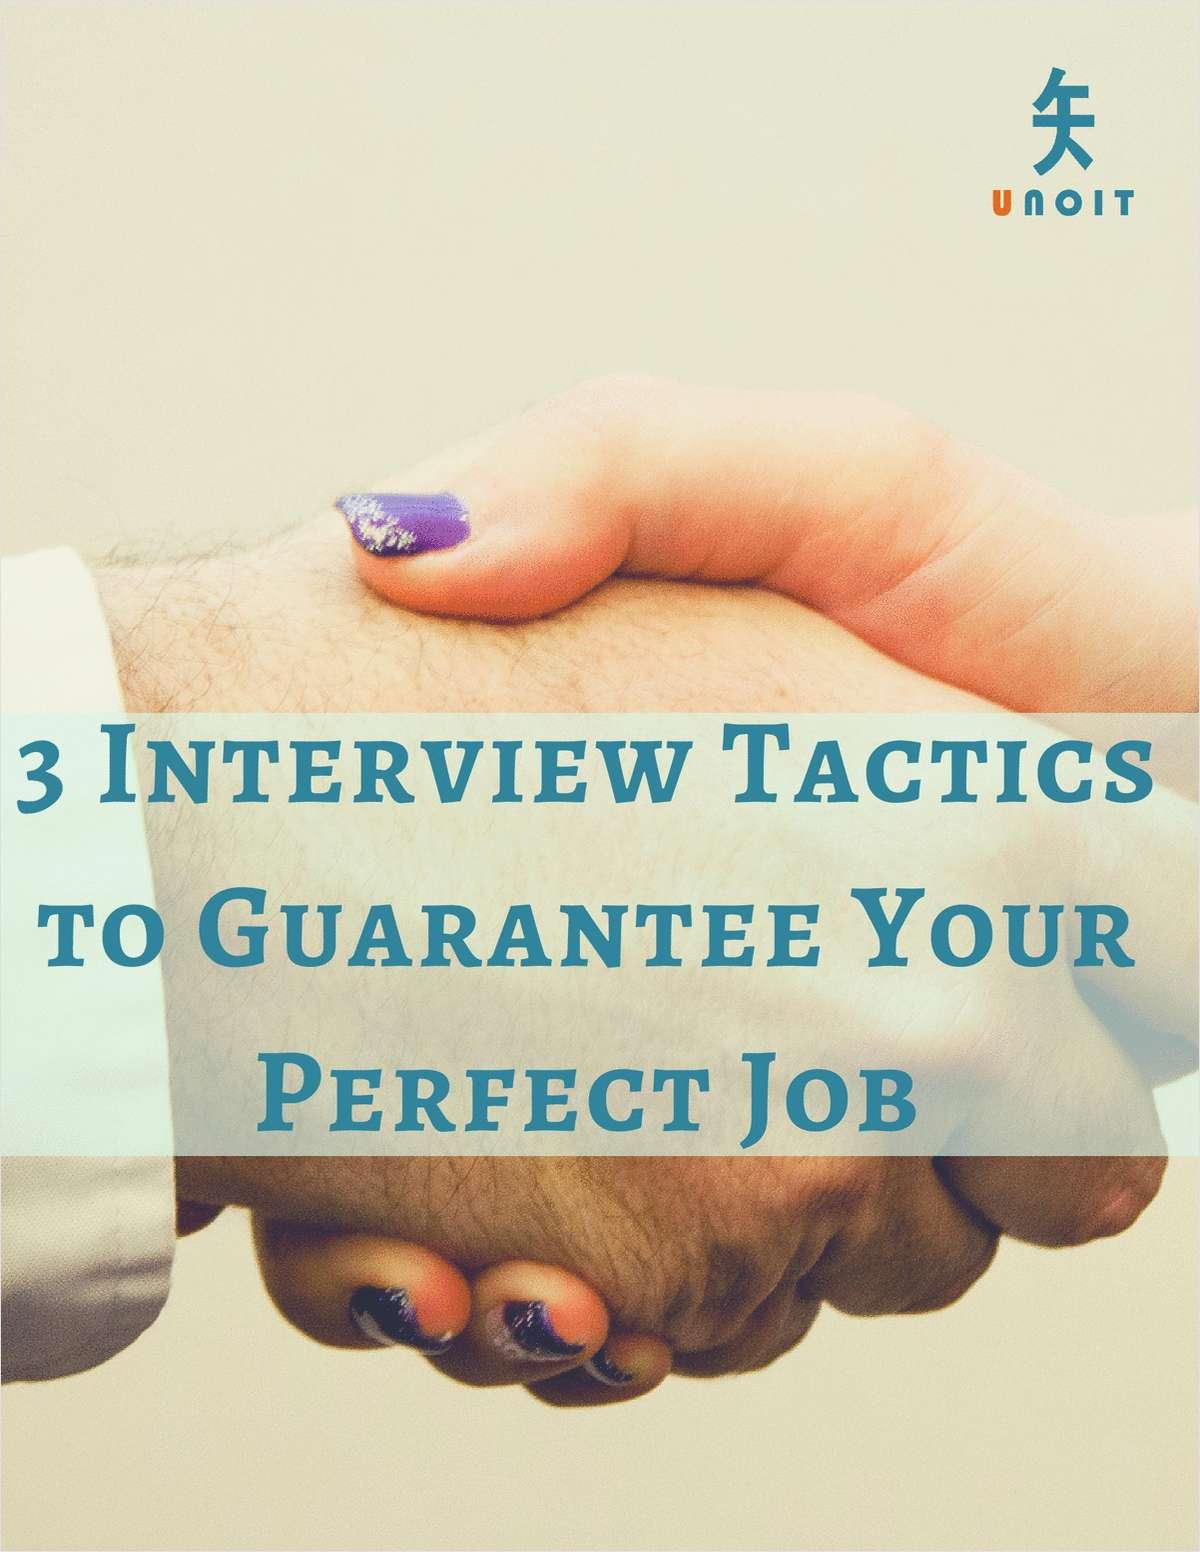 3 Interview Tactics to Guarantee Your Perfect Job